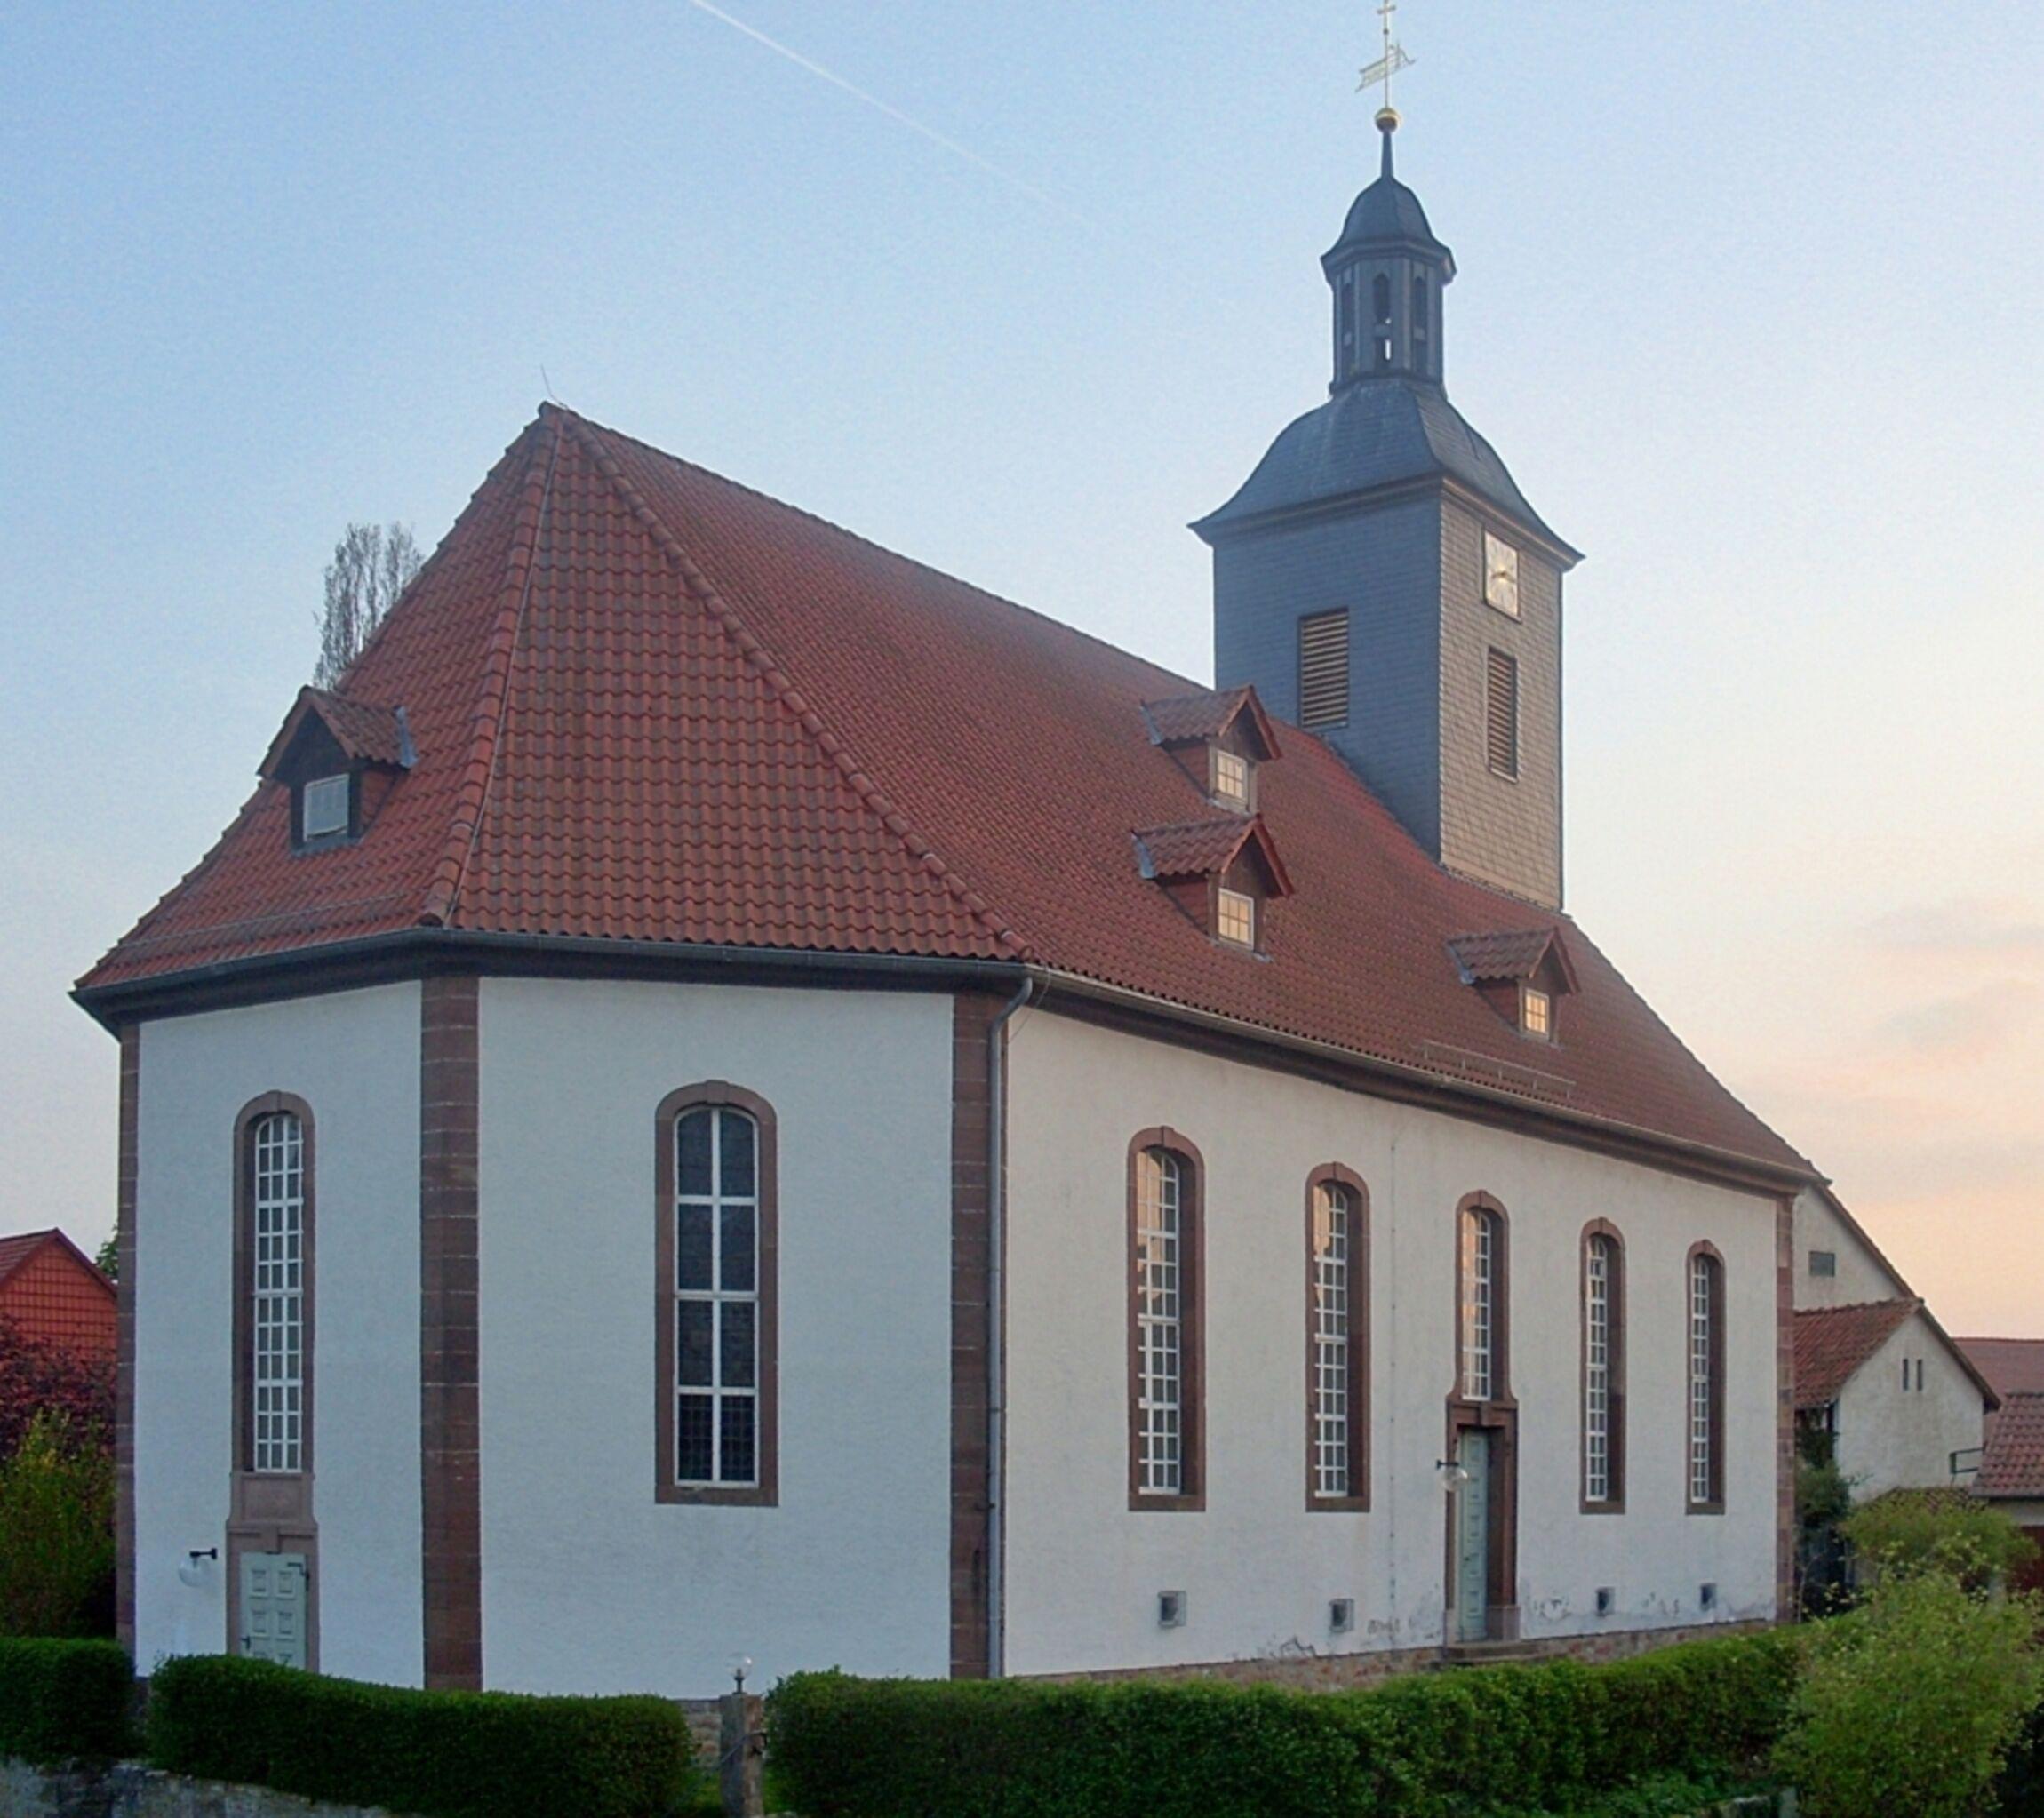 Kirche Odagsen